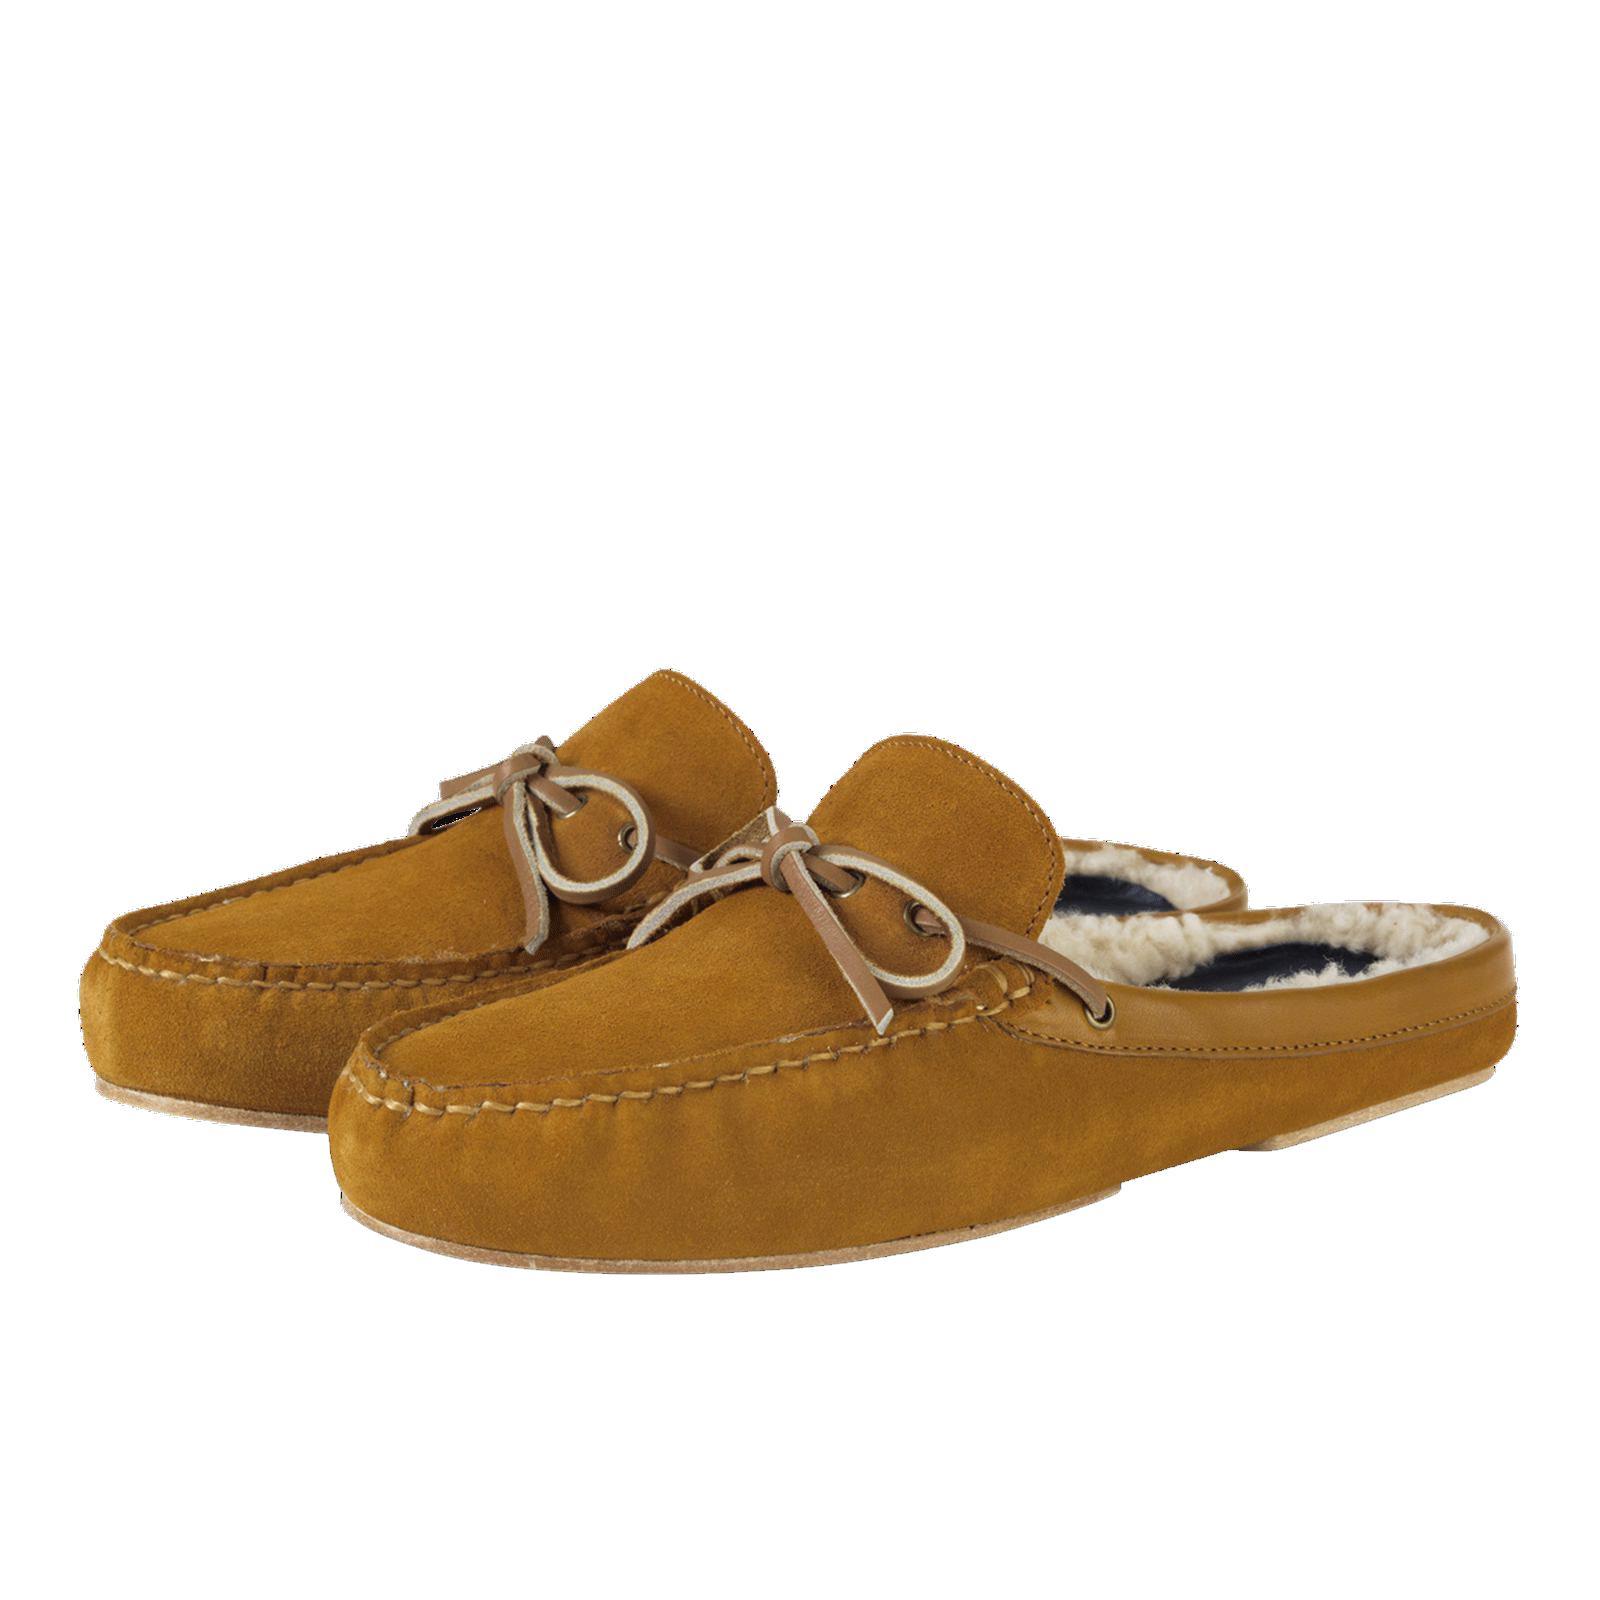 grant scuff slippers men 9m